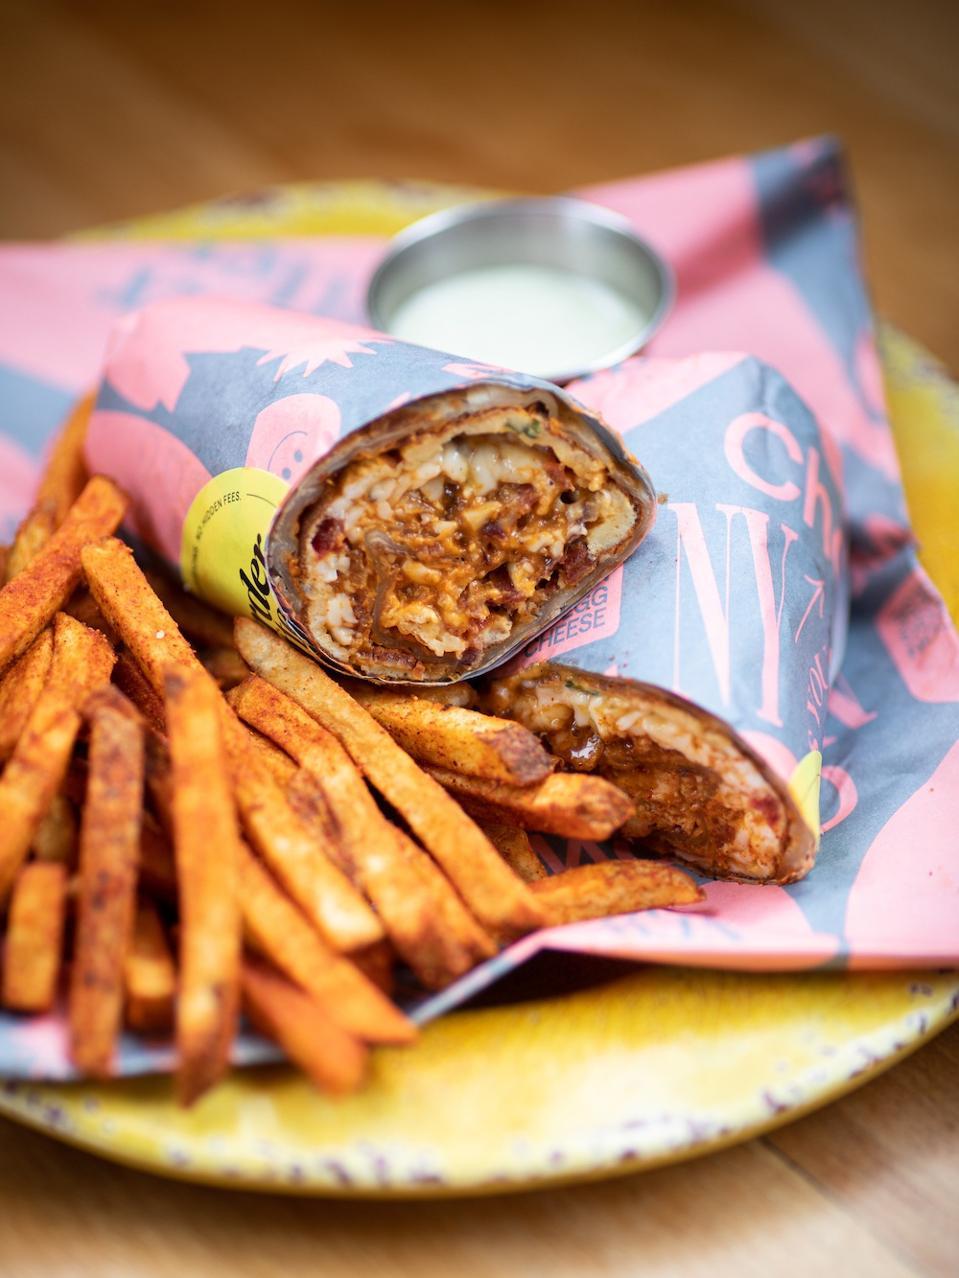 Adda Indian Canteen's bacon, egg and cheese kati roll.